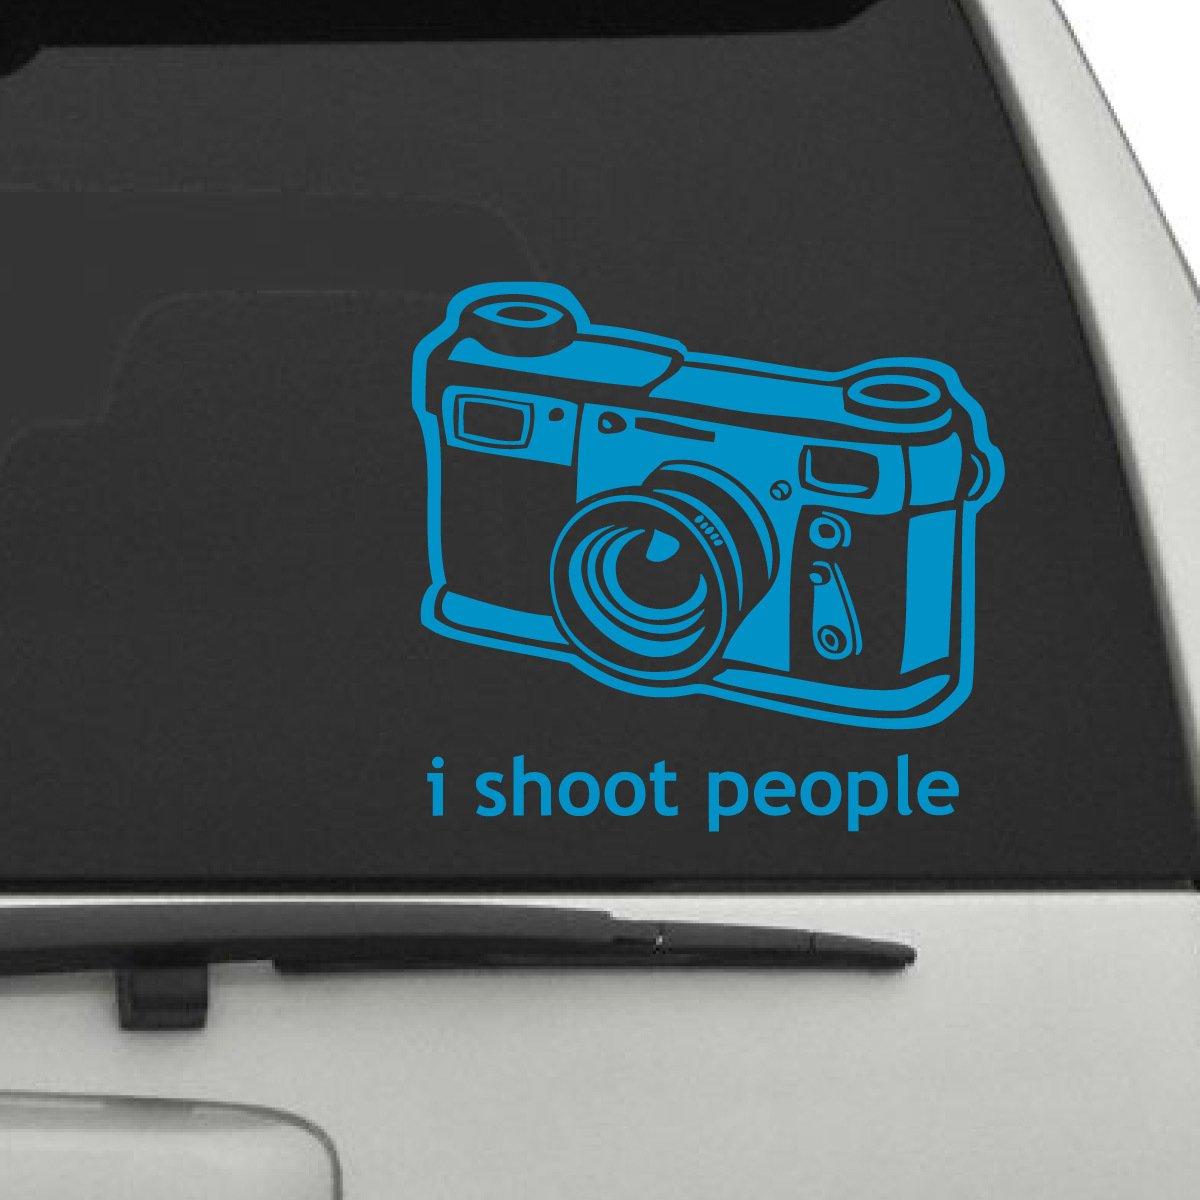 "I Shoot People車デカール、Die Cut Vinyl Decal for Windows車、トラック、ツールボックス、ノートパソコン、ほぼすべてmacbook-ハード、滑らかな表面 7"" H x 8"" W Titans-Unique-Design-111812 7\ グレー B071P39JYD"